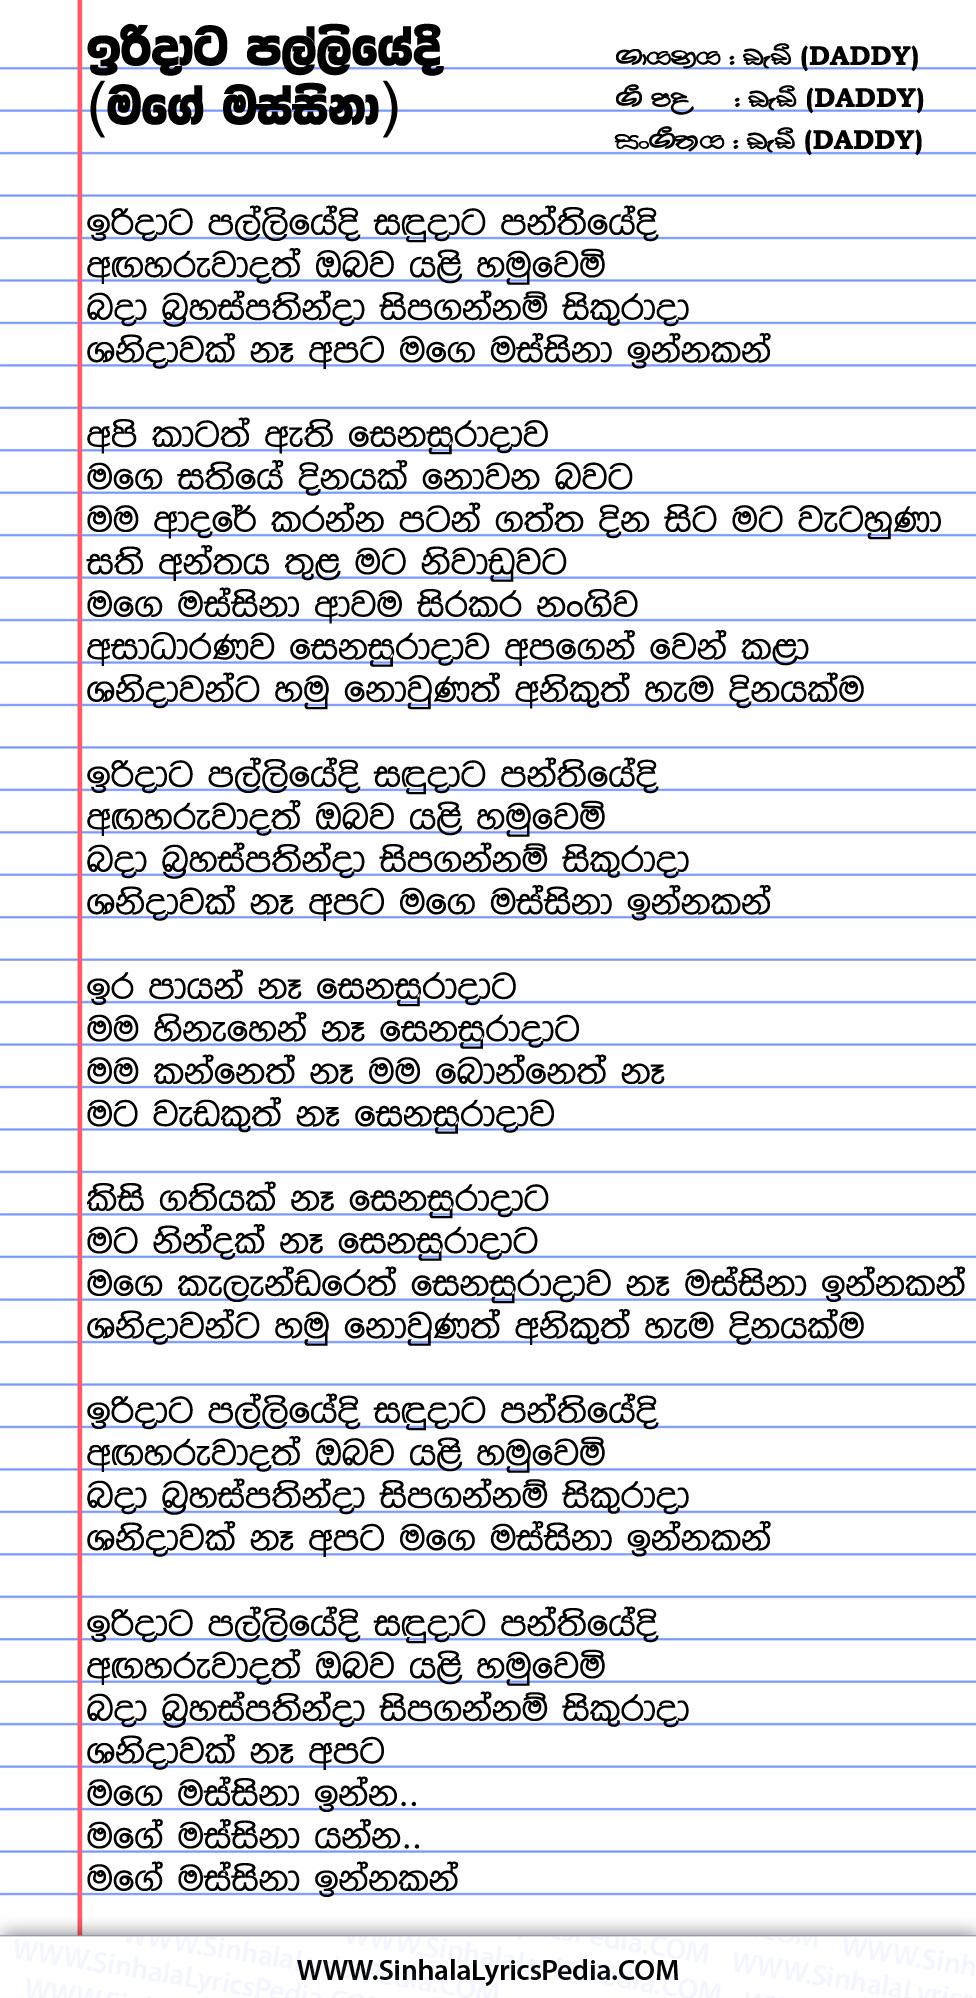 Iridata Palliyedi (Mage Massina) Song Lyrics